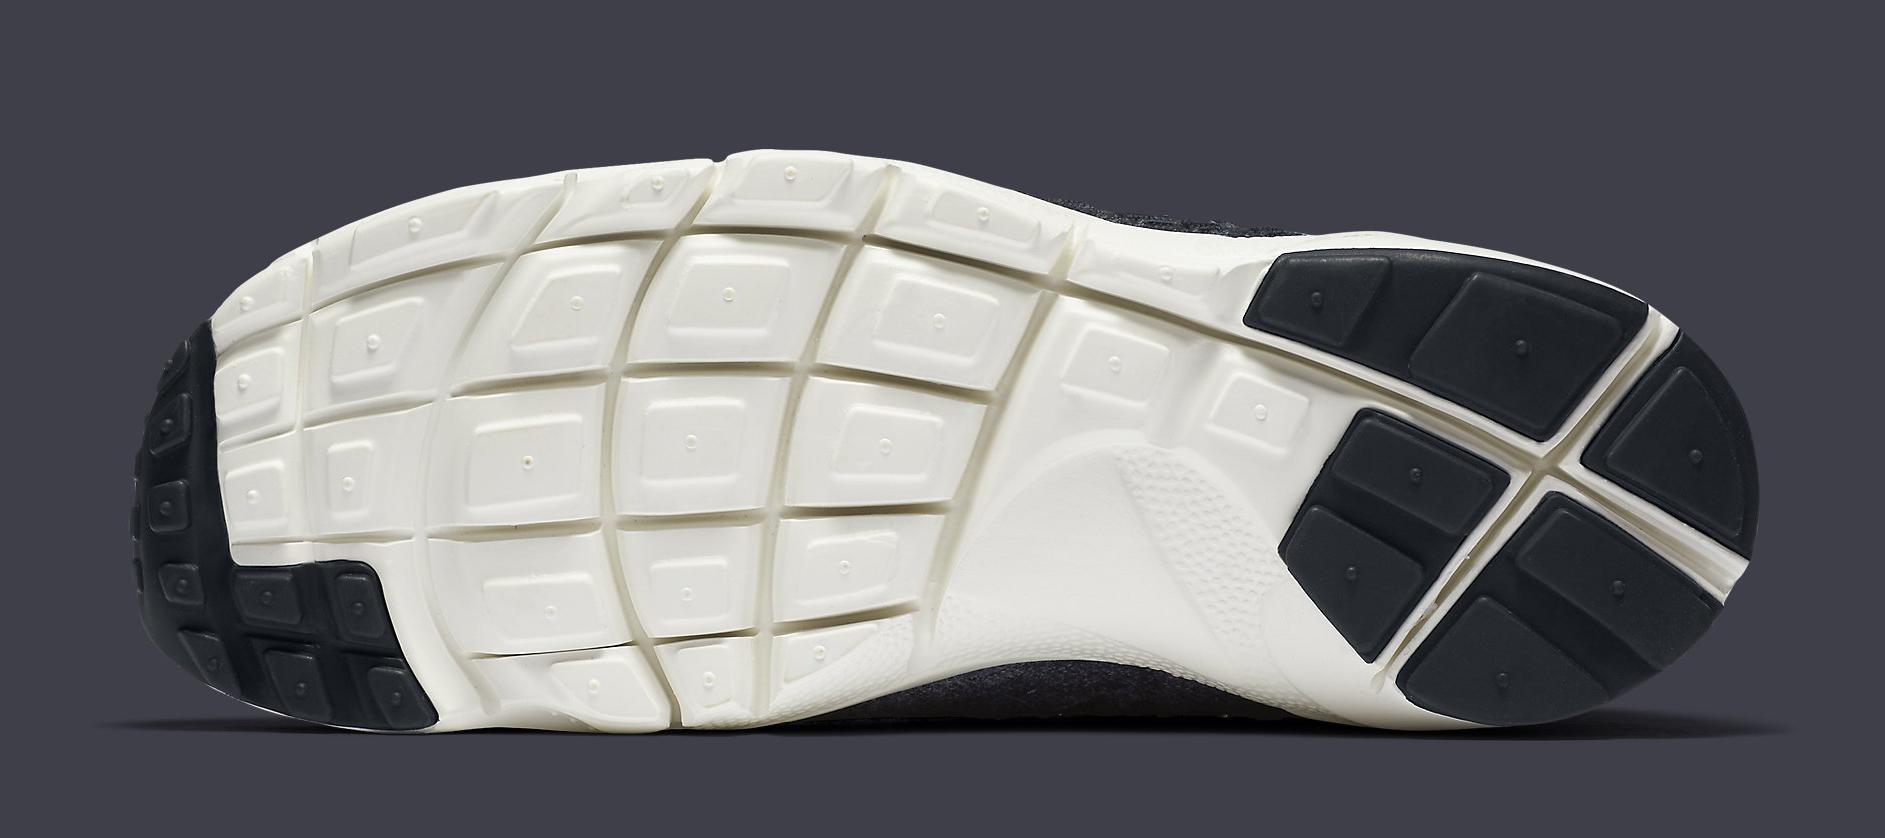 separation shoes cb920 85b4c Image via Nike Nike Footscape Woven Chukka Denim 857874-400 Sole